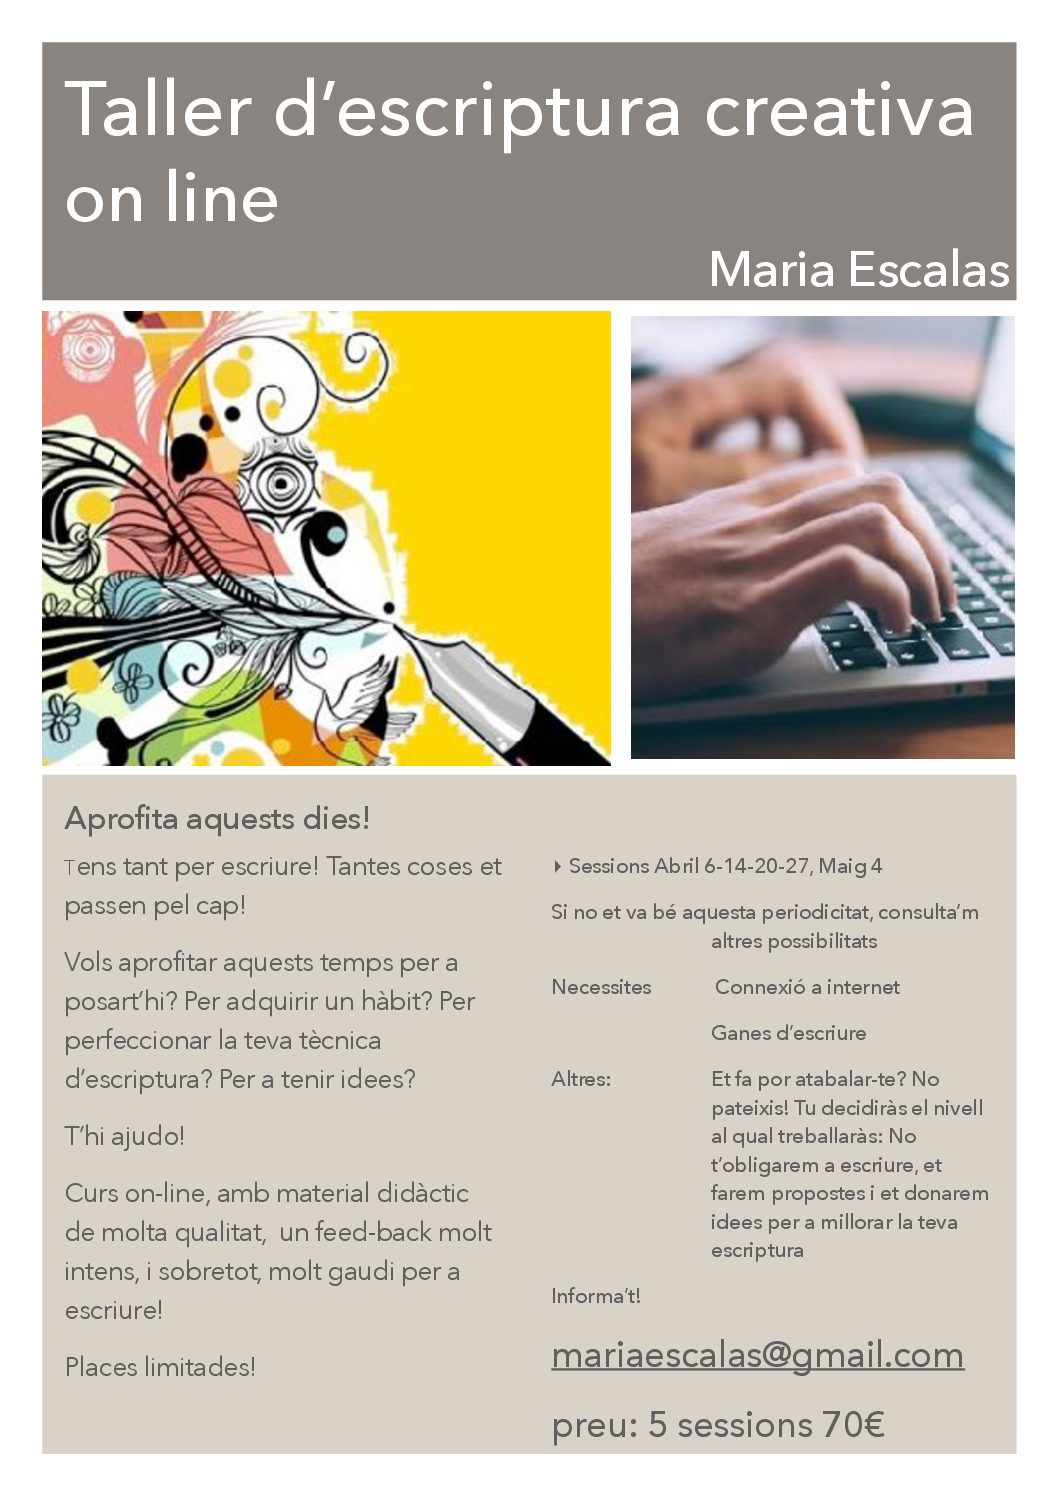 Maria Escalas imparteix un taller d'escriptura creativa